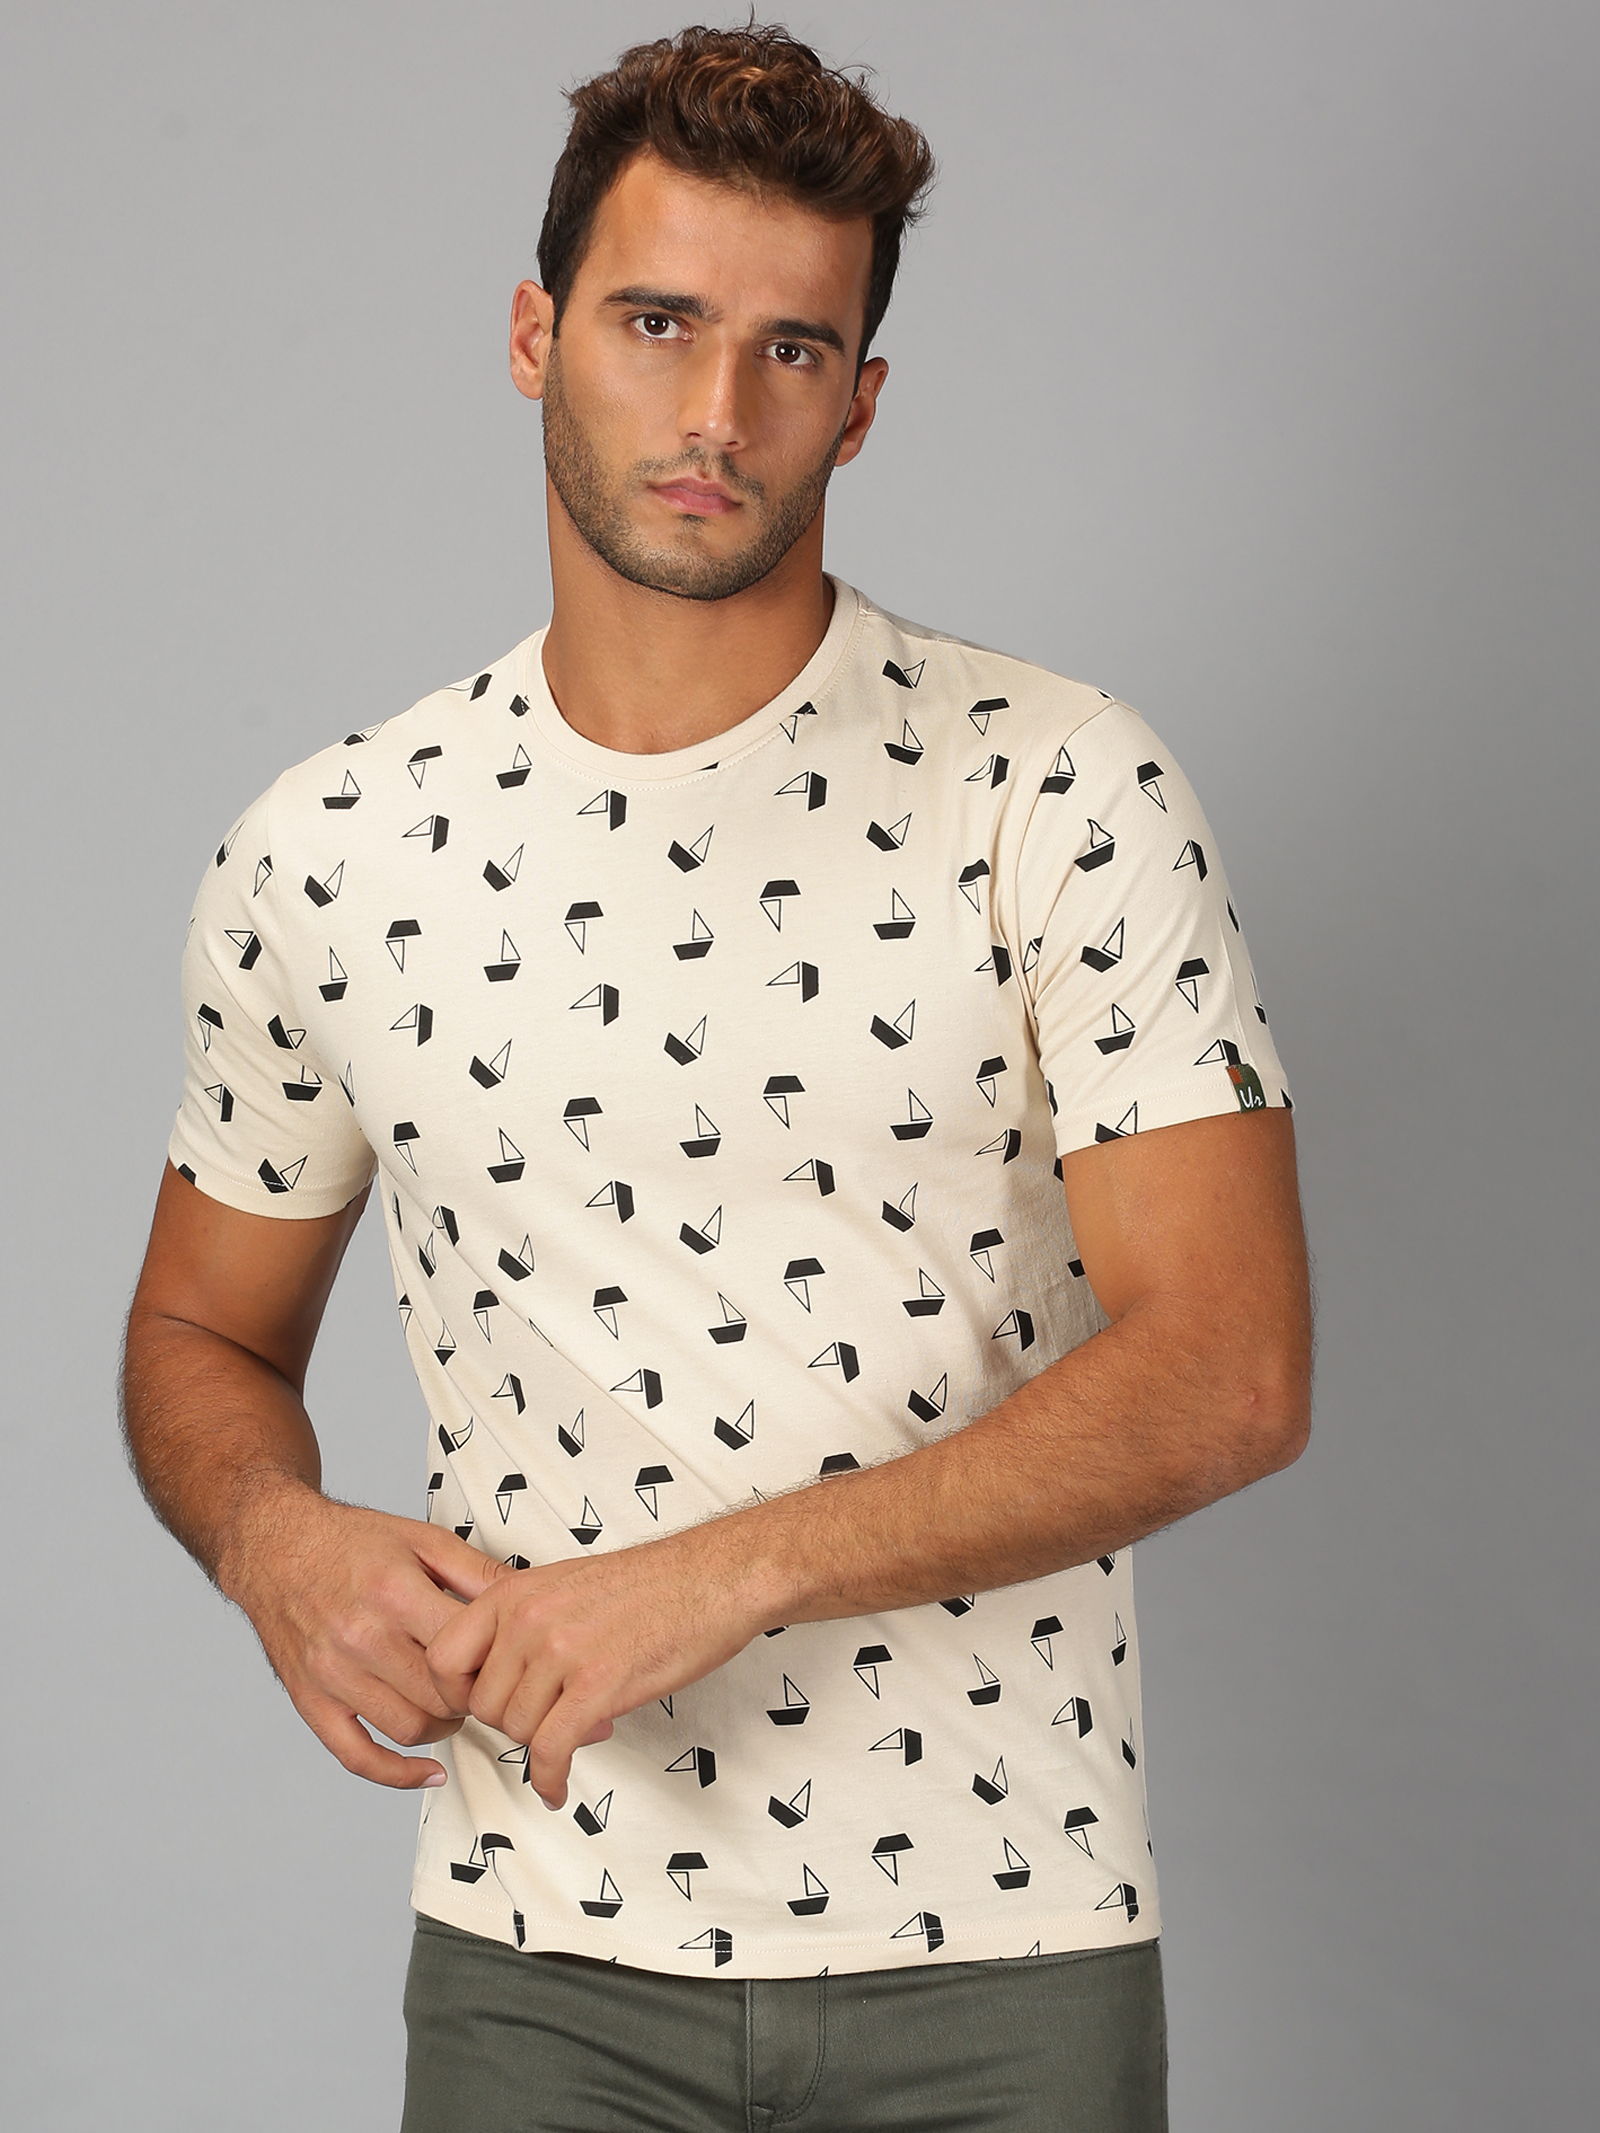 UrGear | Mens Round Neck Printed Light Grey T-Shirt